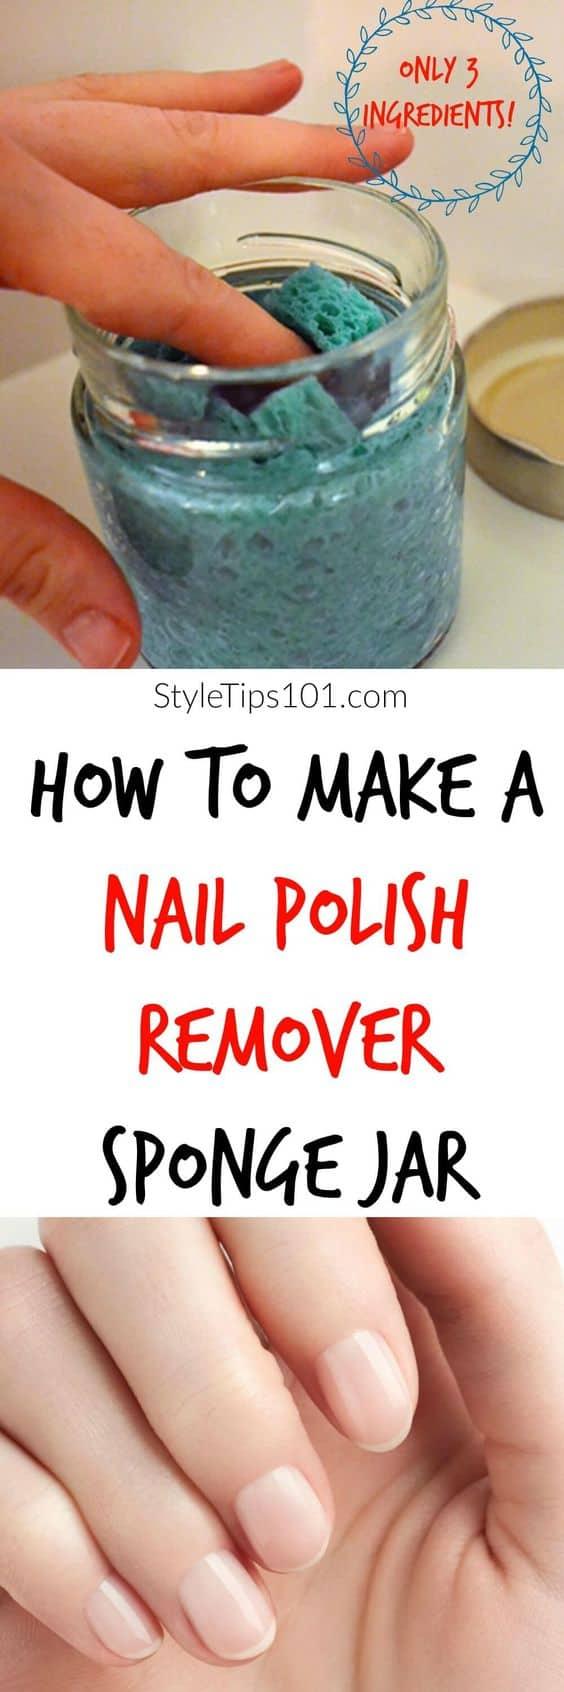 Easy To Make DIY Nail Polish Remover Ideas